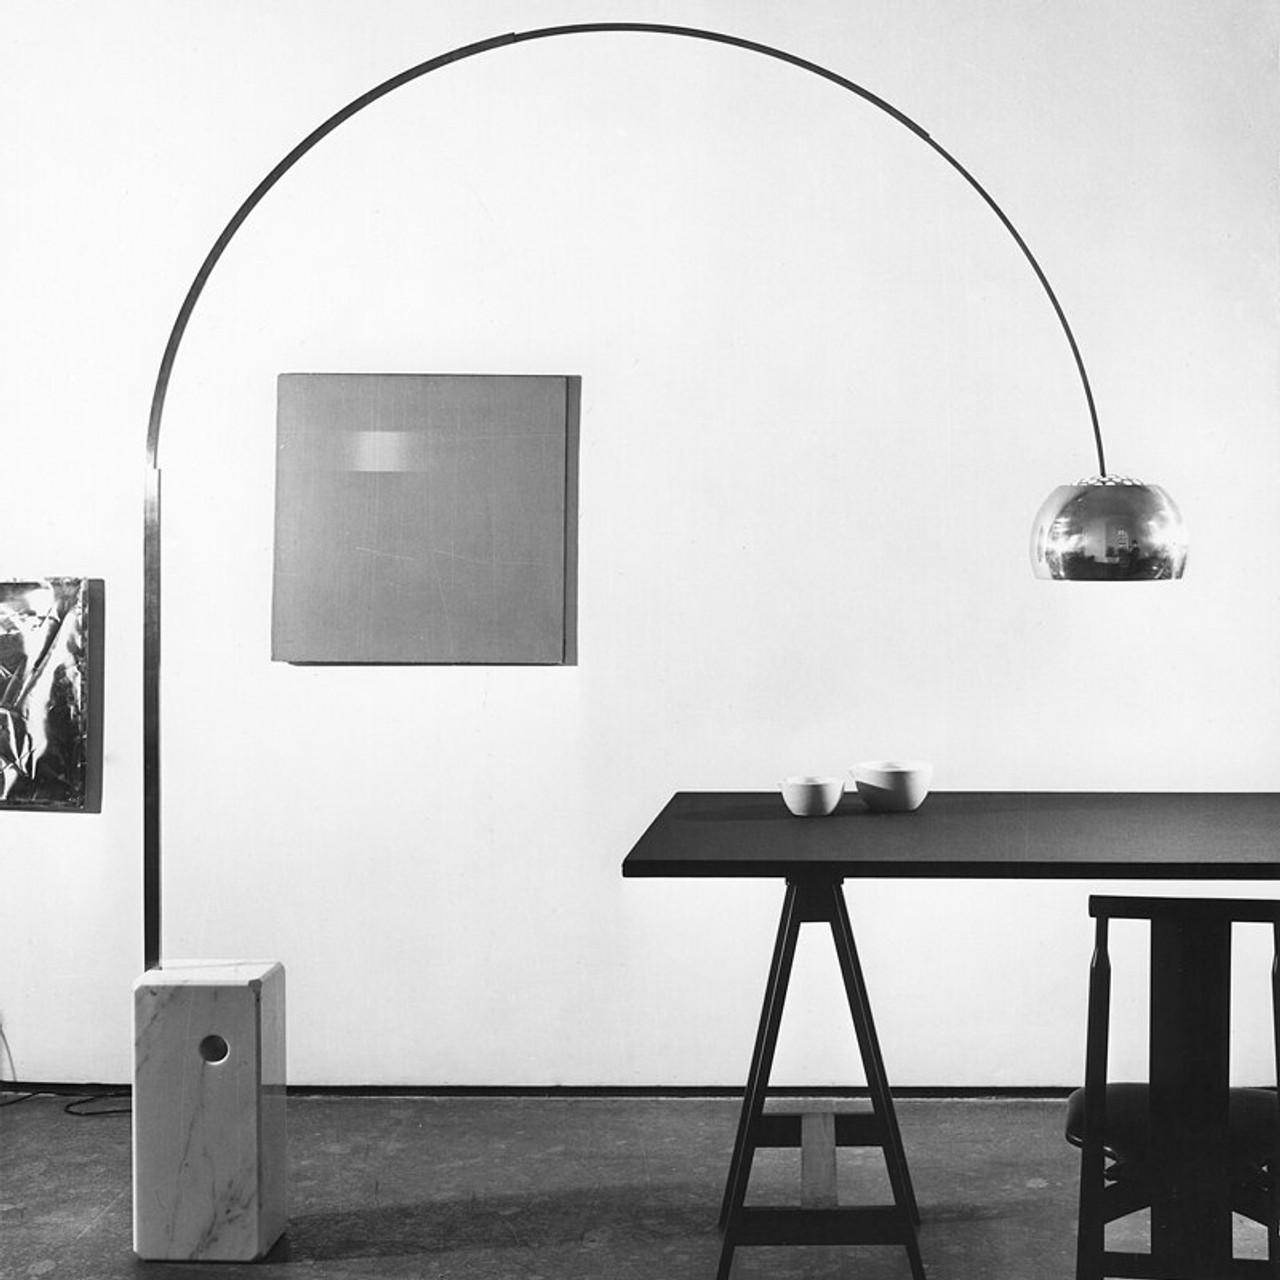 floor lighting 1. Arco Floor Lamp By Achille Castiglioni - Dining Room Lighting Setup 1